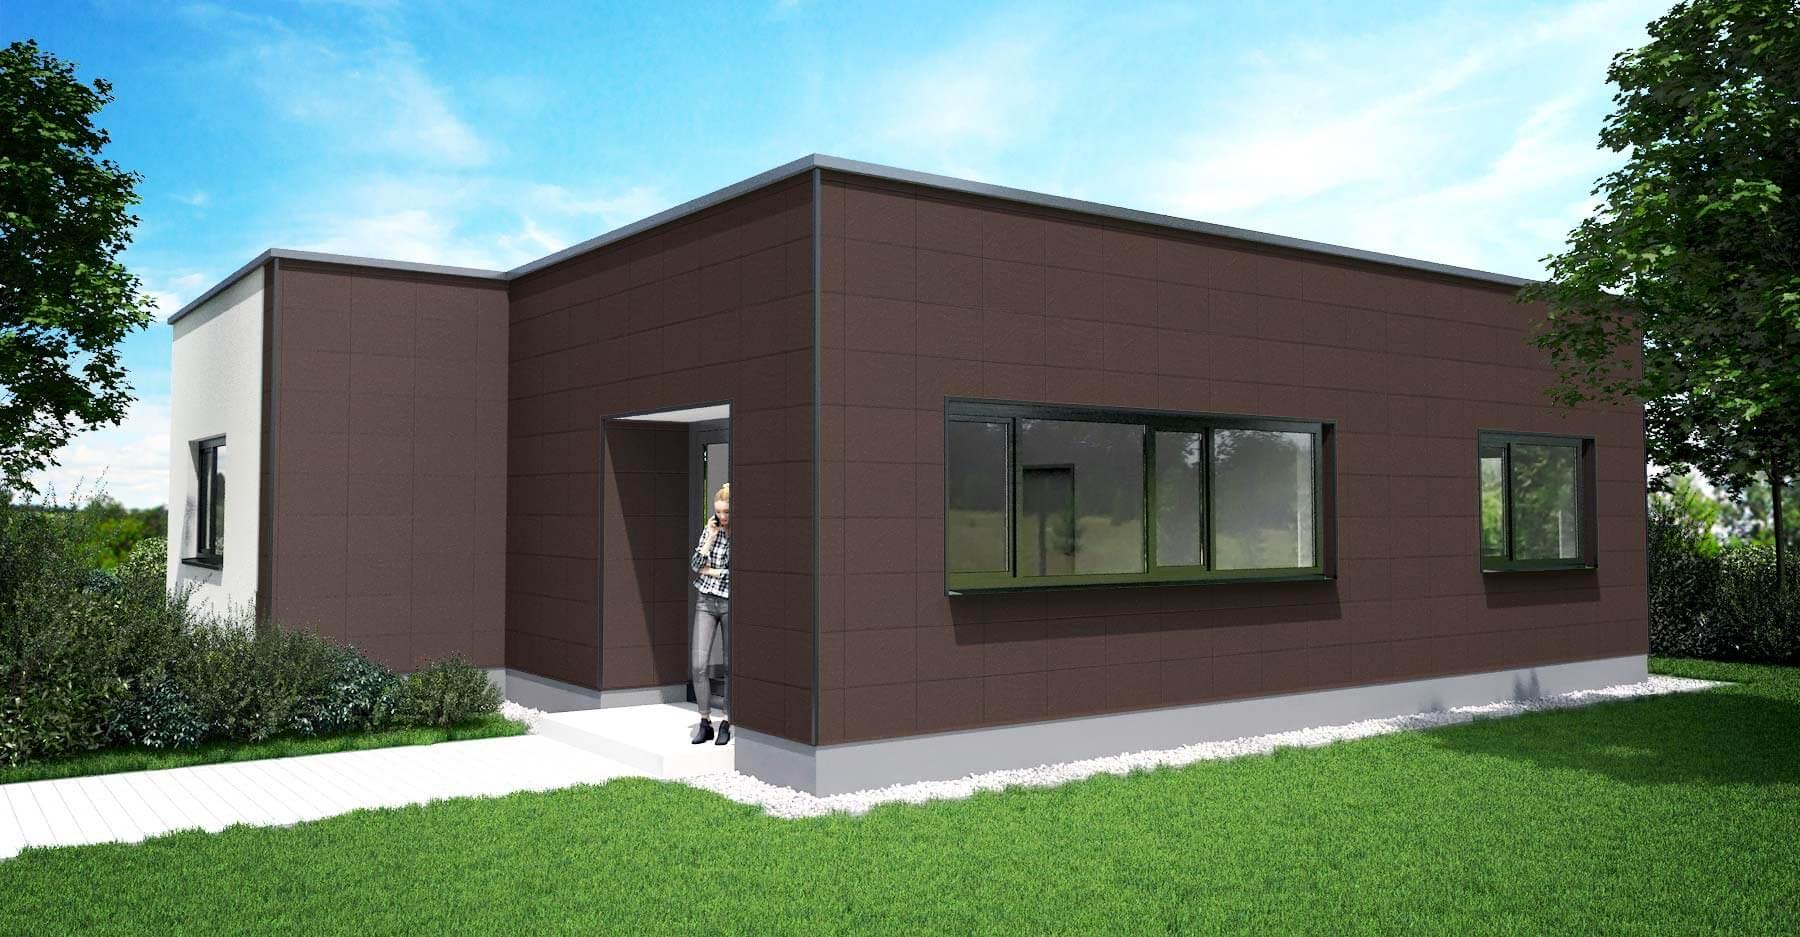 Zierer Fassadenplatten Ss1 Aus Kunststoff In Schiefer Optik